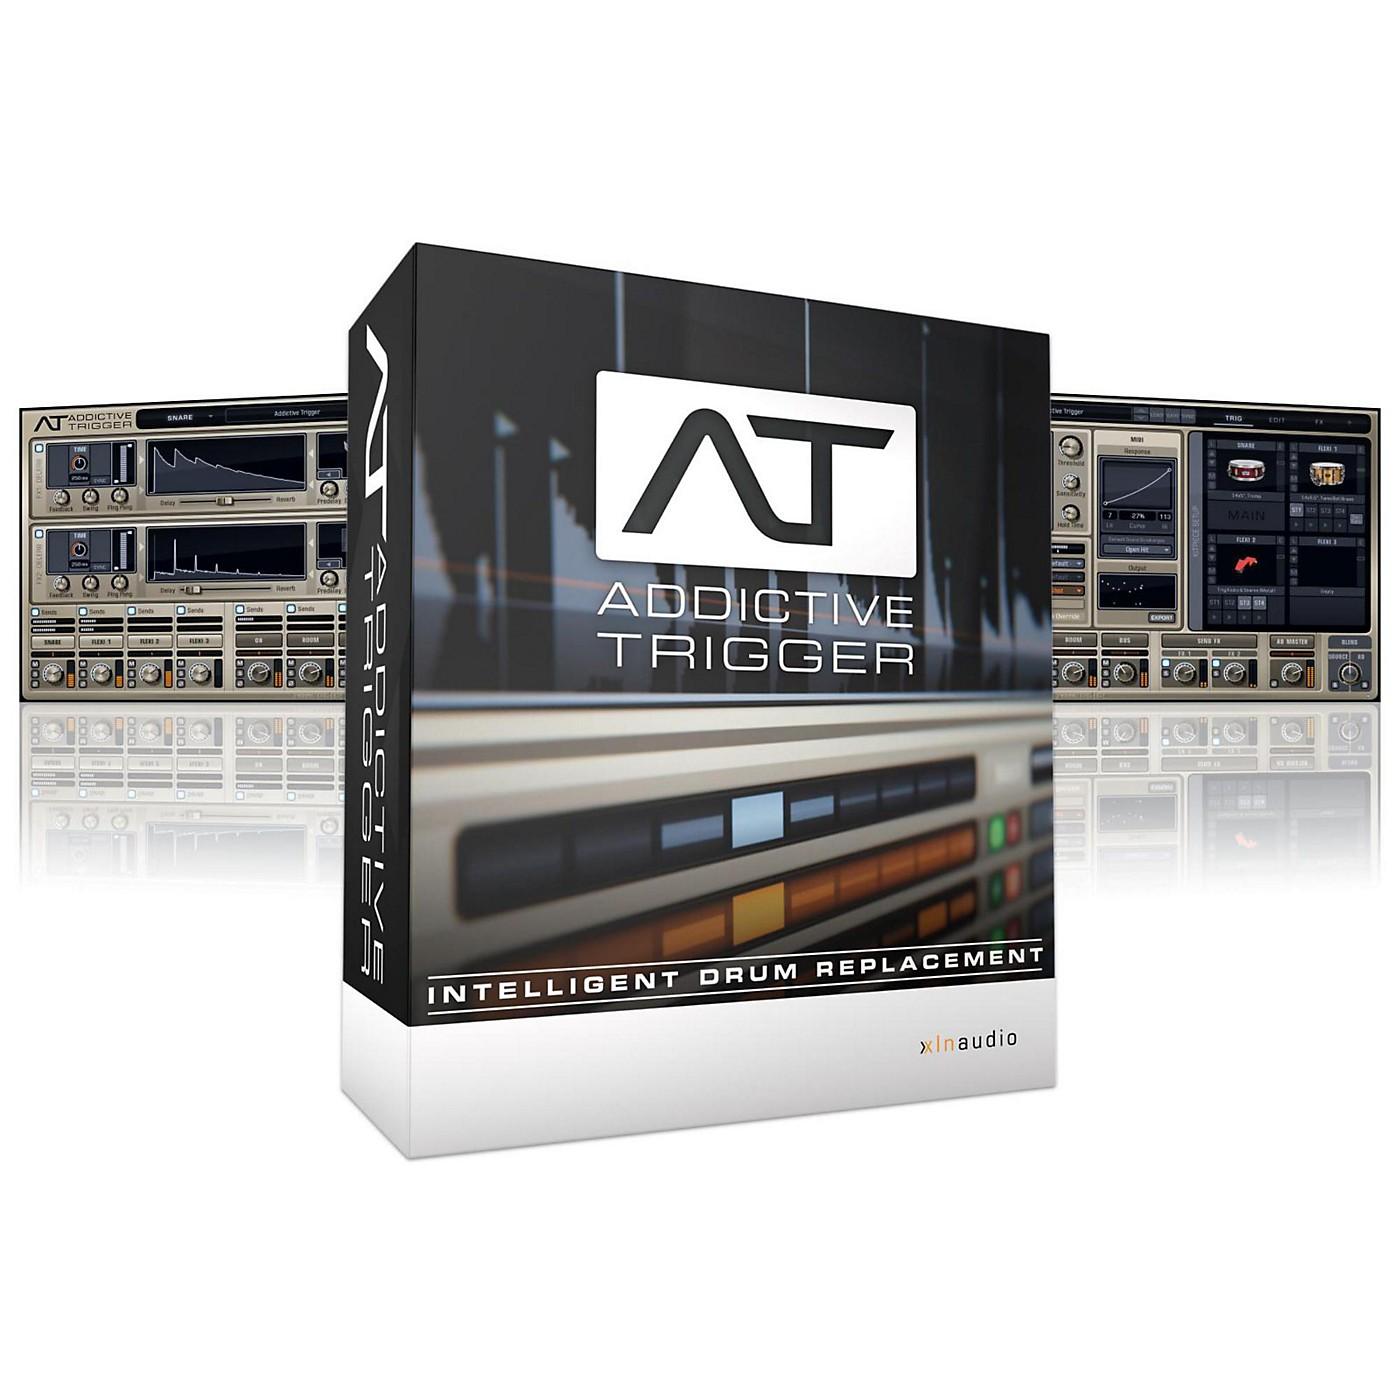 XLN Audio Addictive Trigger thumbnail